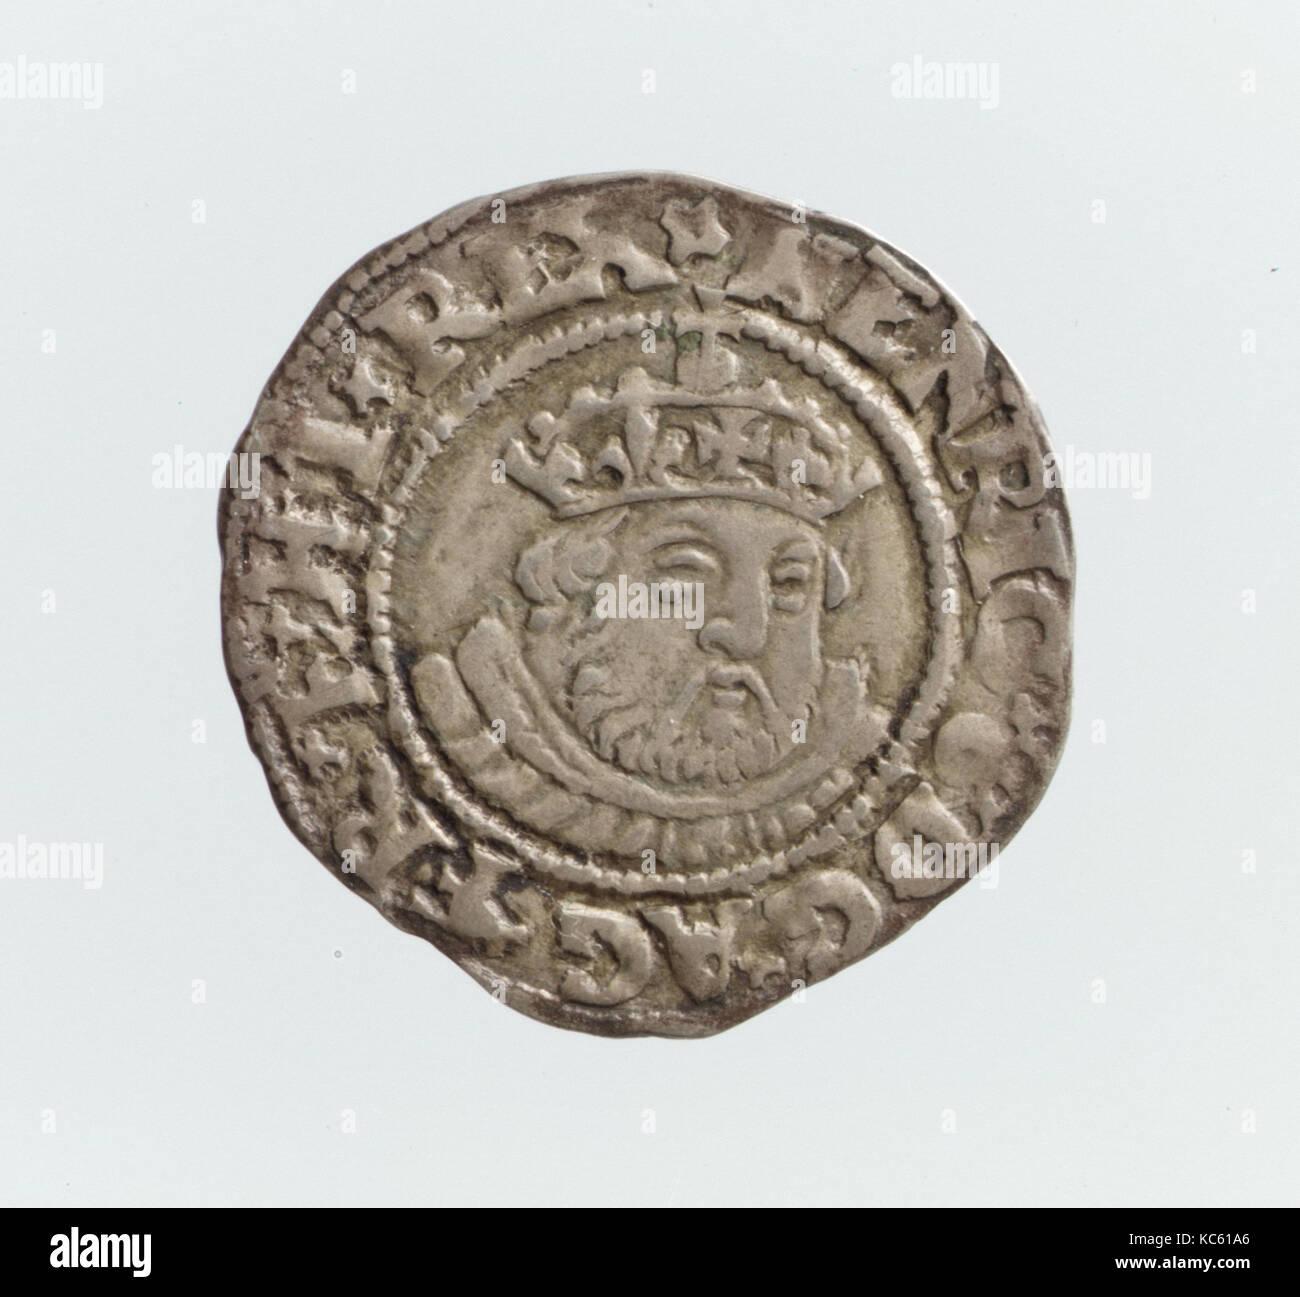 Half groat of Henry VIII (r. 1509–47), 1544–47, British, Silver, Diameter: 19 mm, Coins - Stock Image